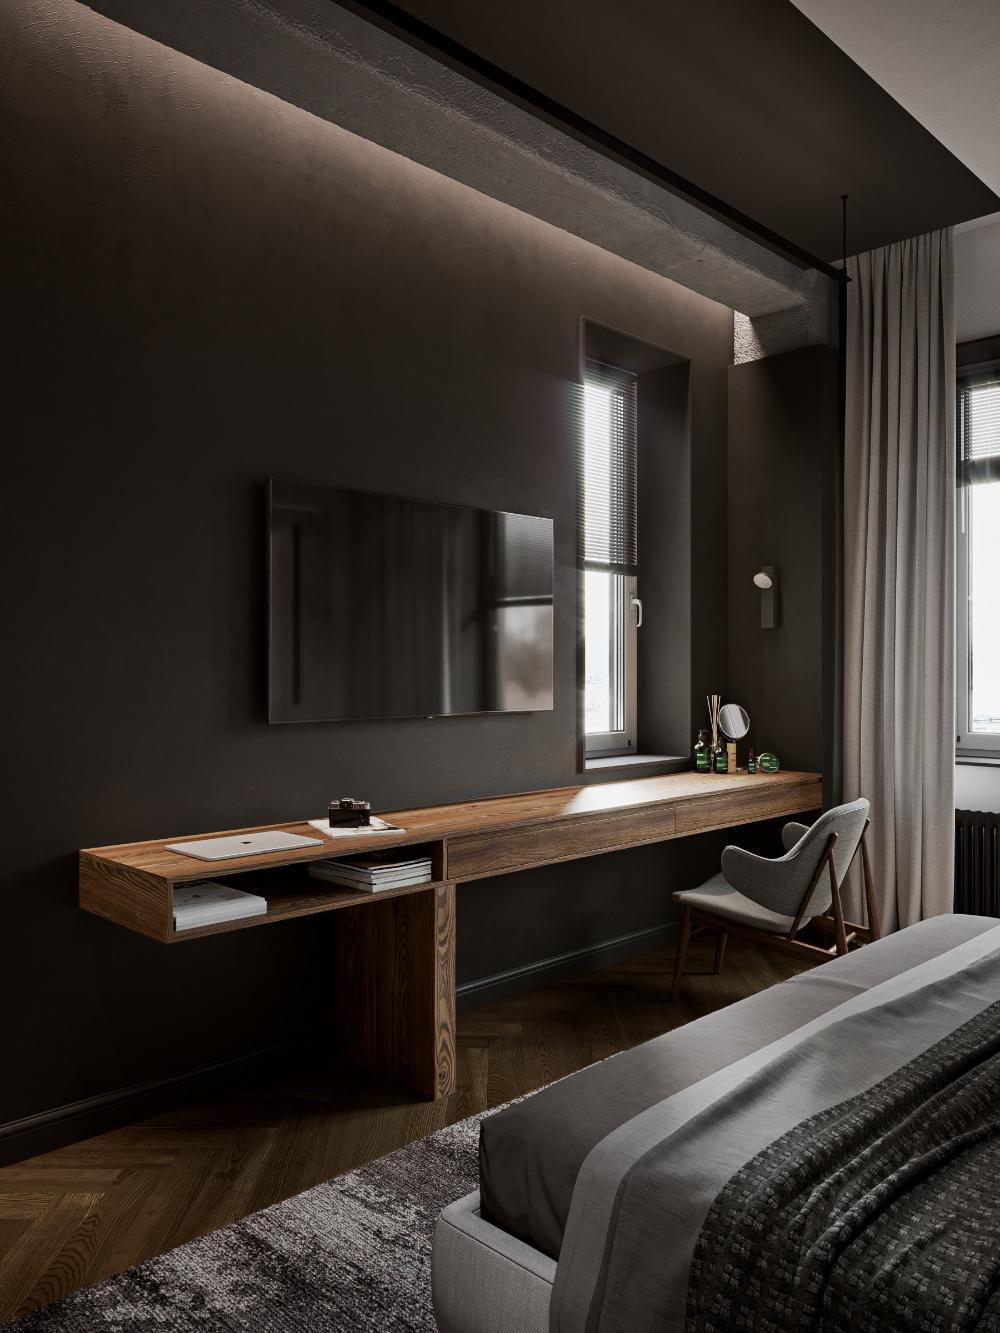 Interior Design Tv Room: Home, Room Interior Design